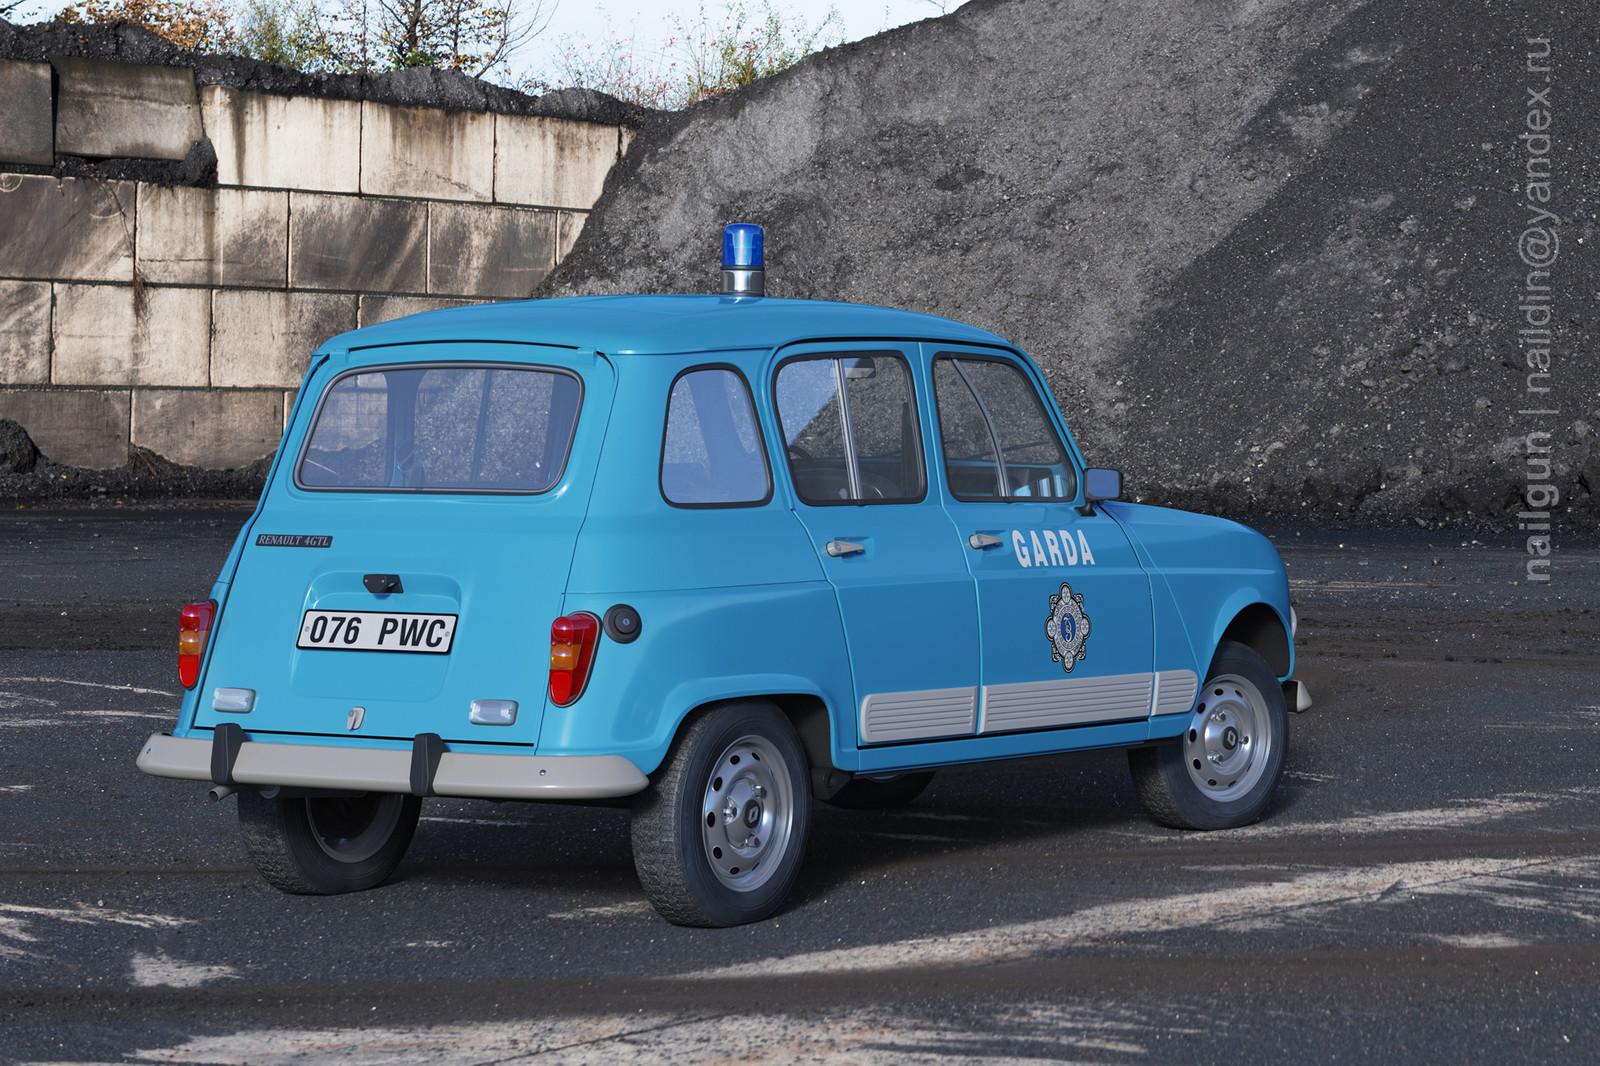 Police Ireland